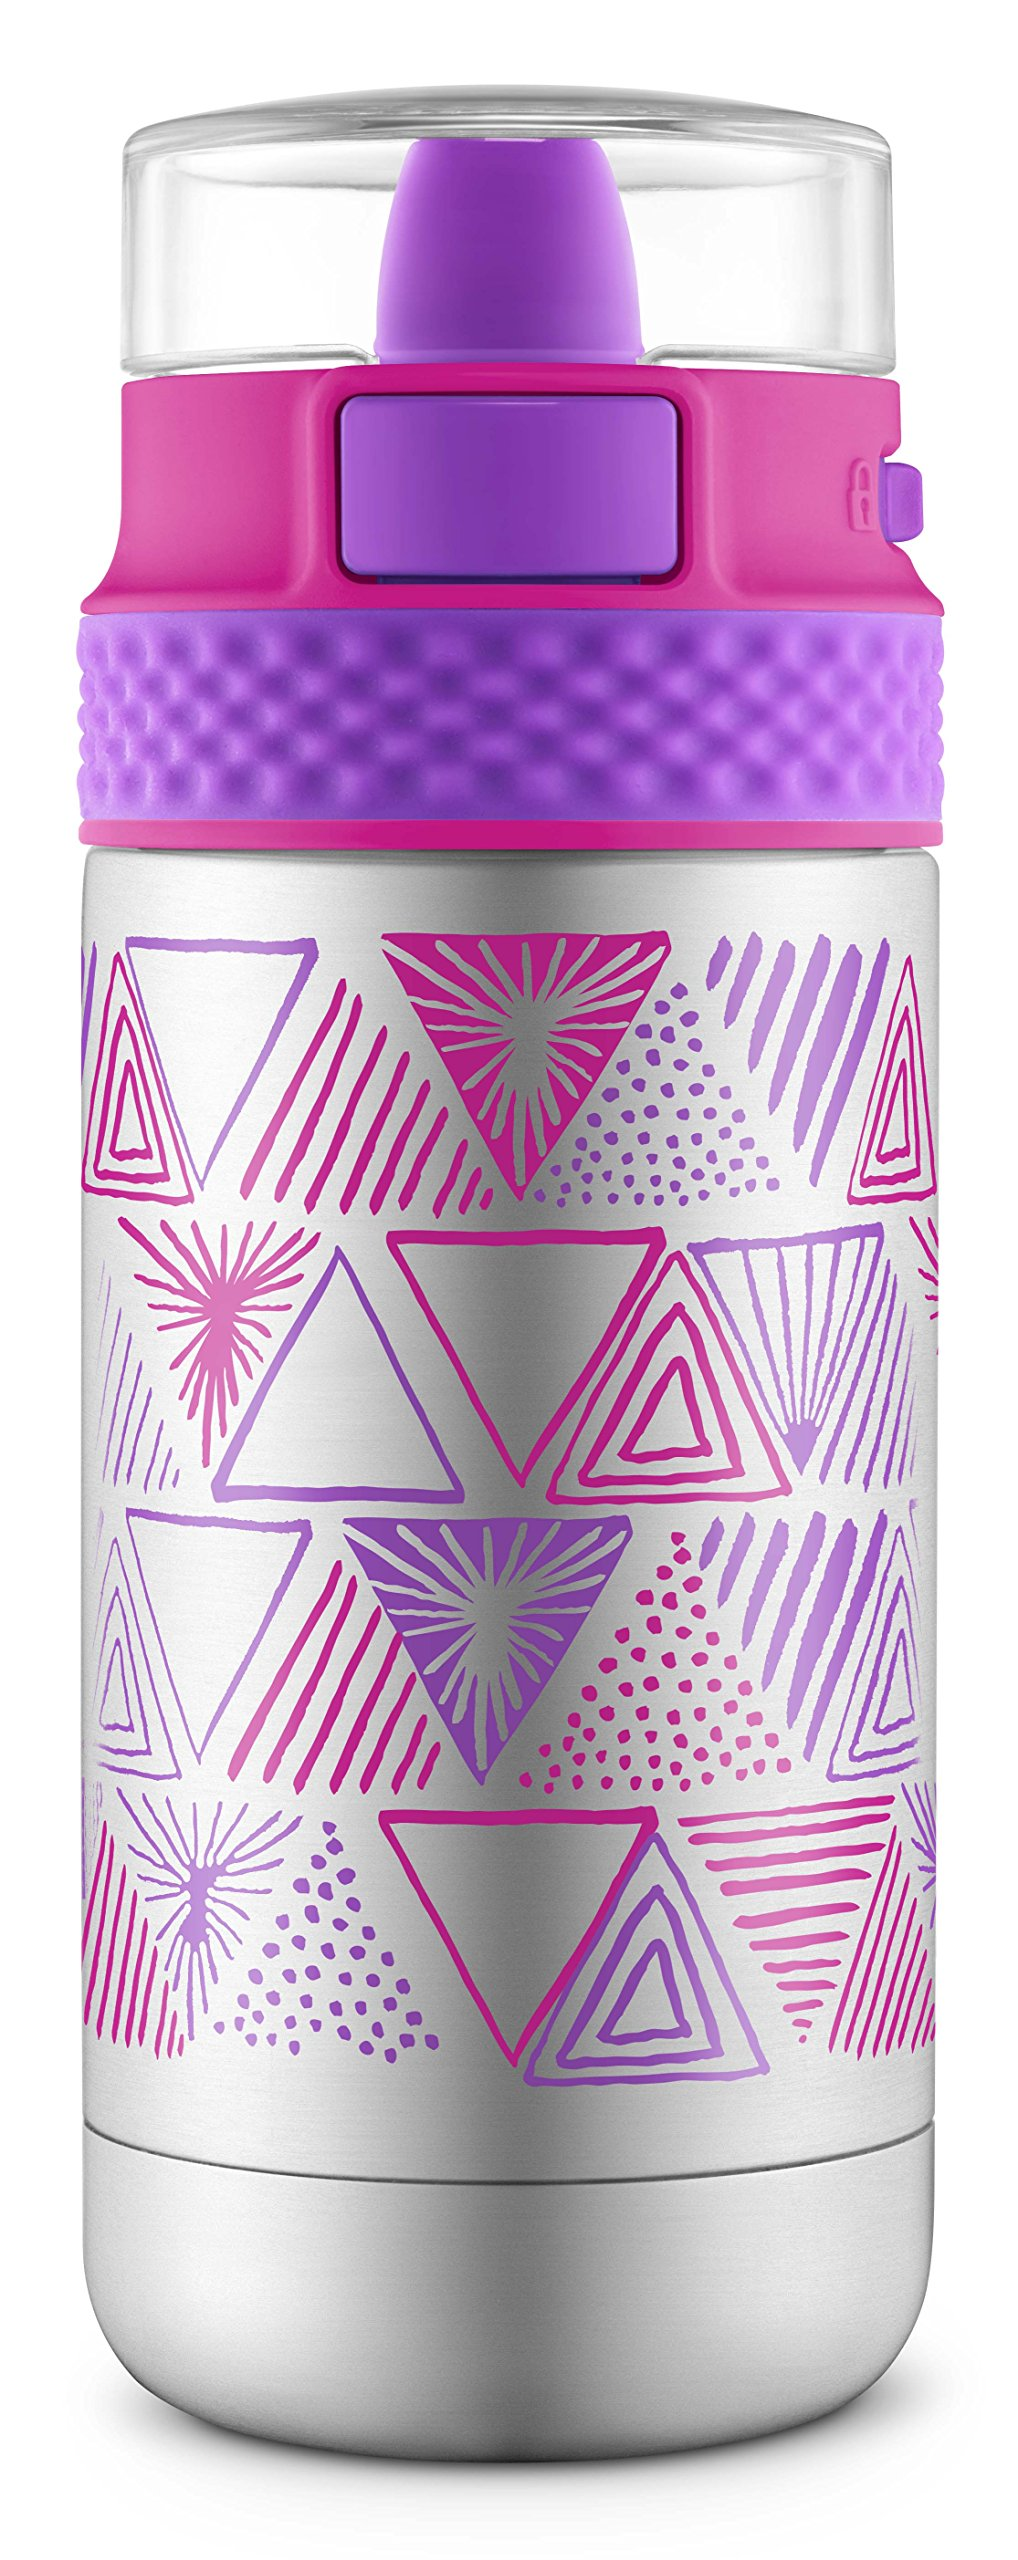 Ello Ride Stainless Steel Water Bottle, Pink/Purple, 14 oz by Ello